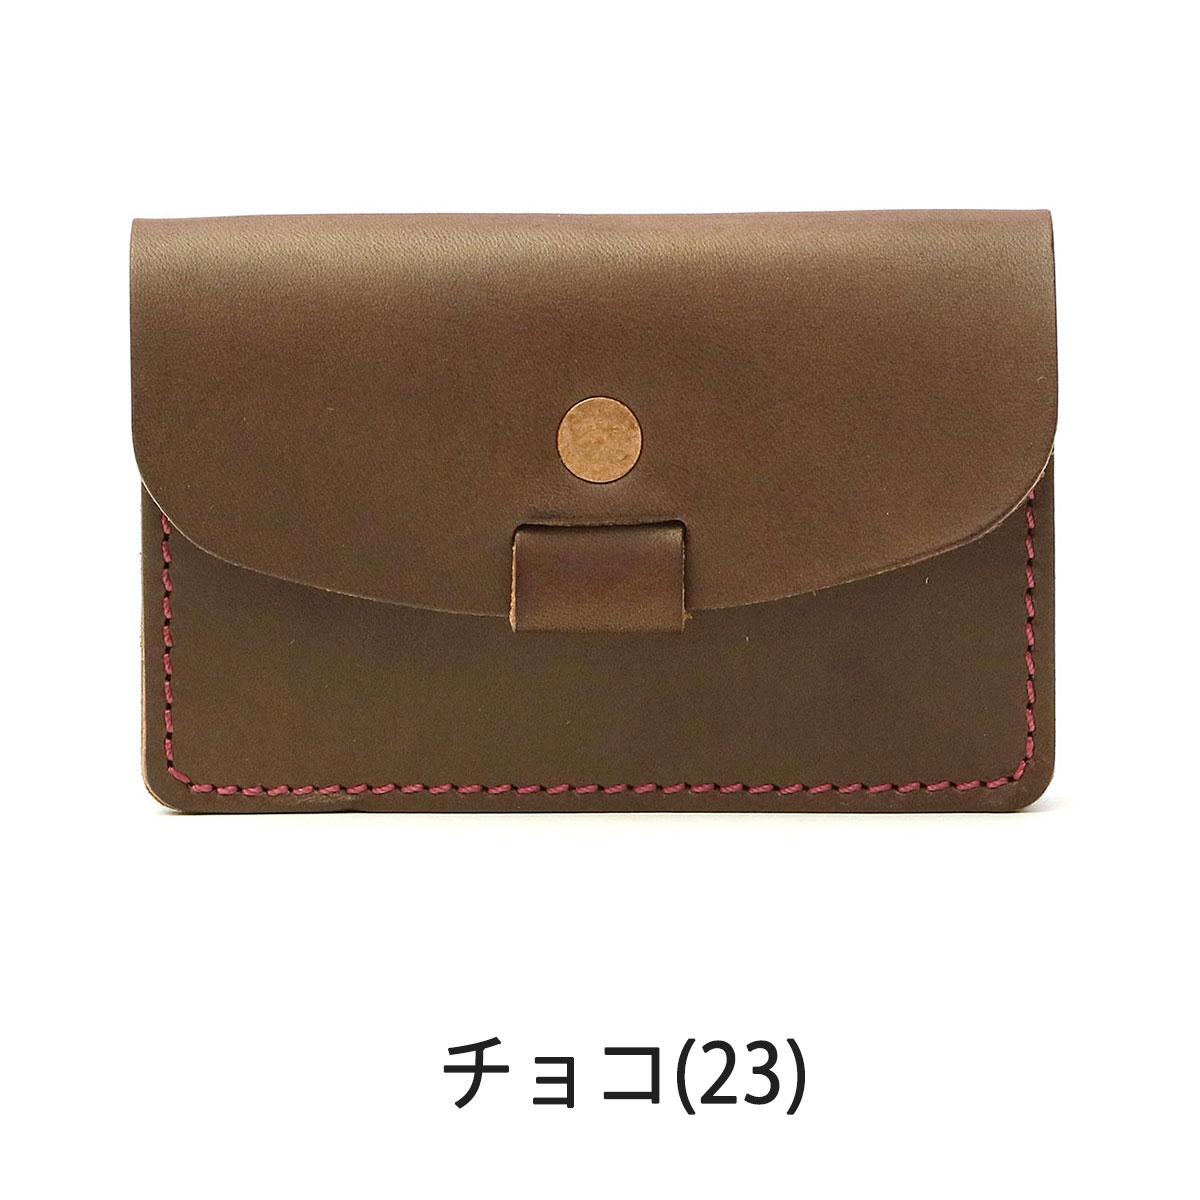 slow wallet toscana card case business card holder mens ladies 333s08b - Card Holder